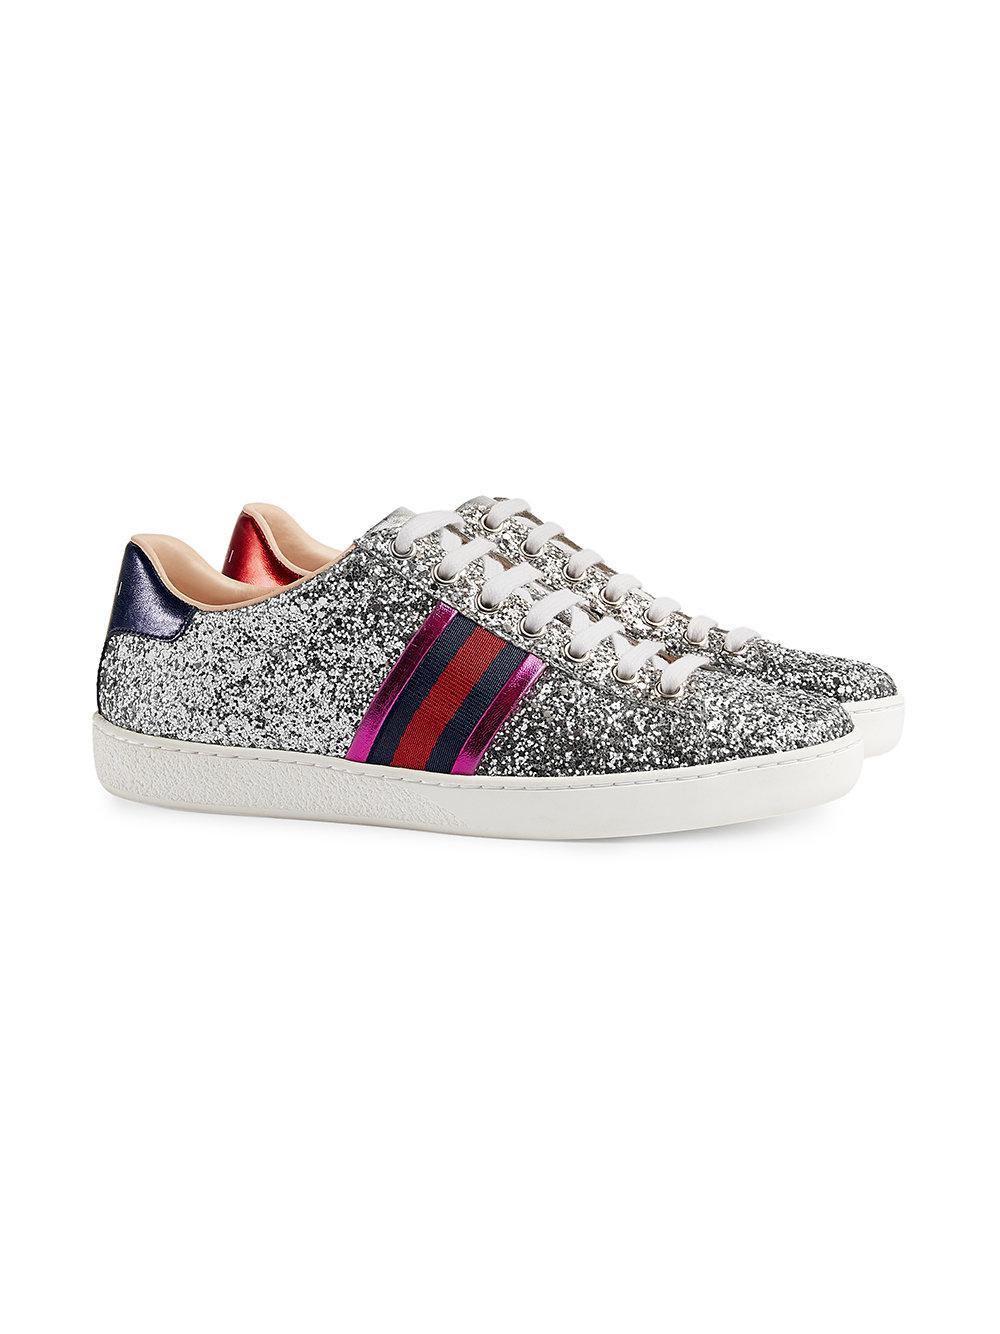 3c1d512d6 Lyst - Gucci Ace Glitter Low-top Sneaker in Gray